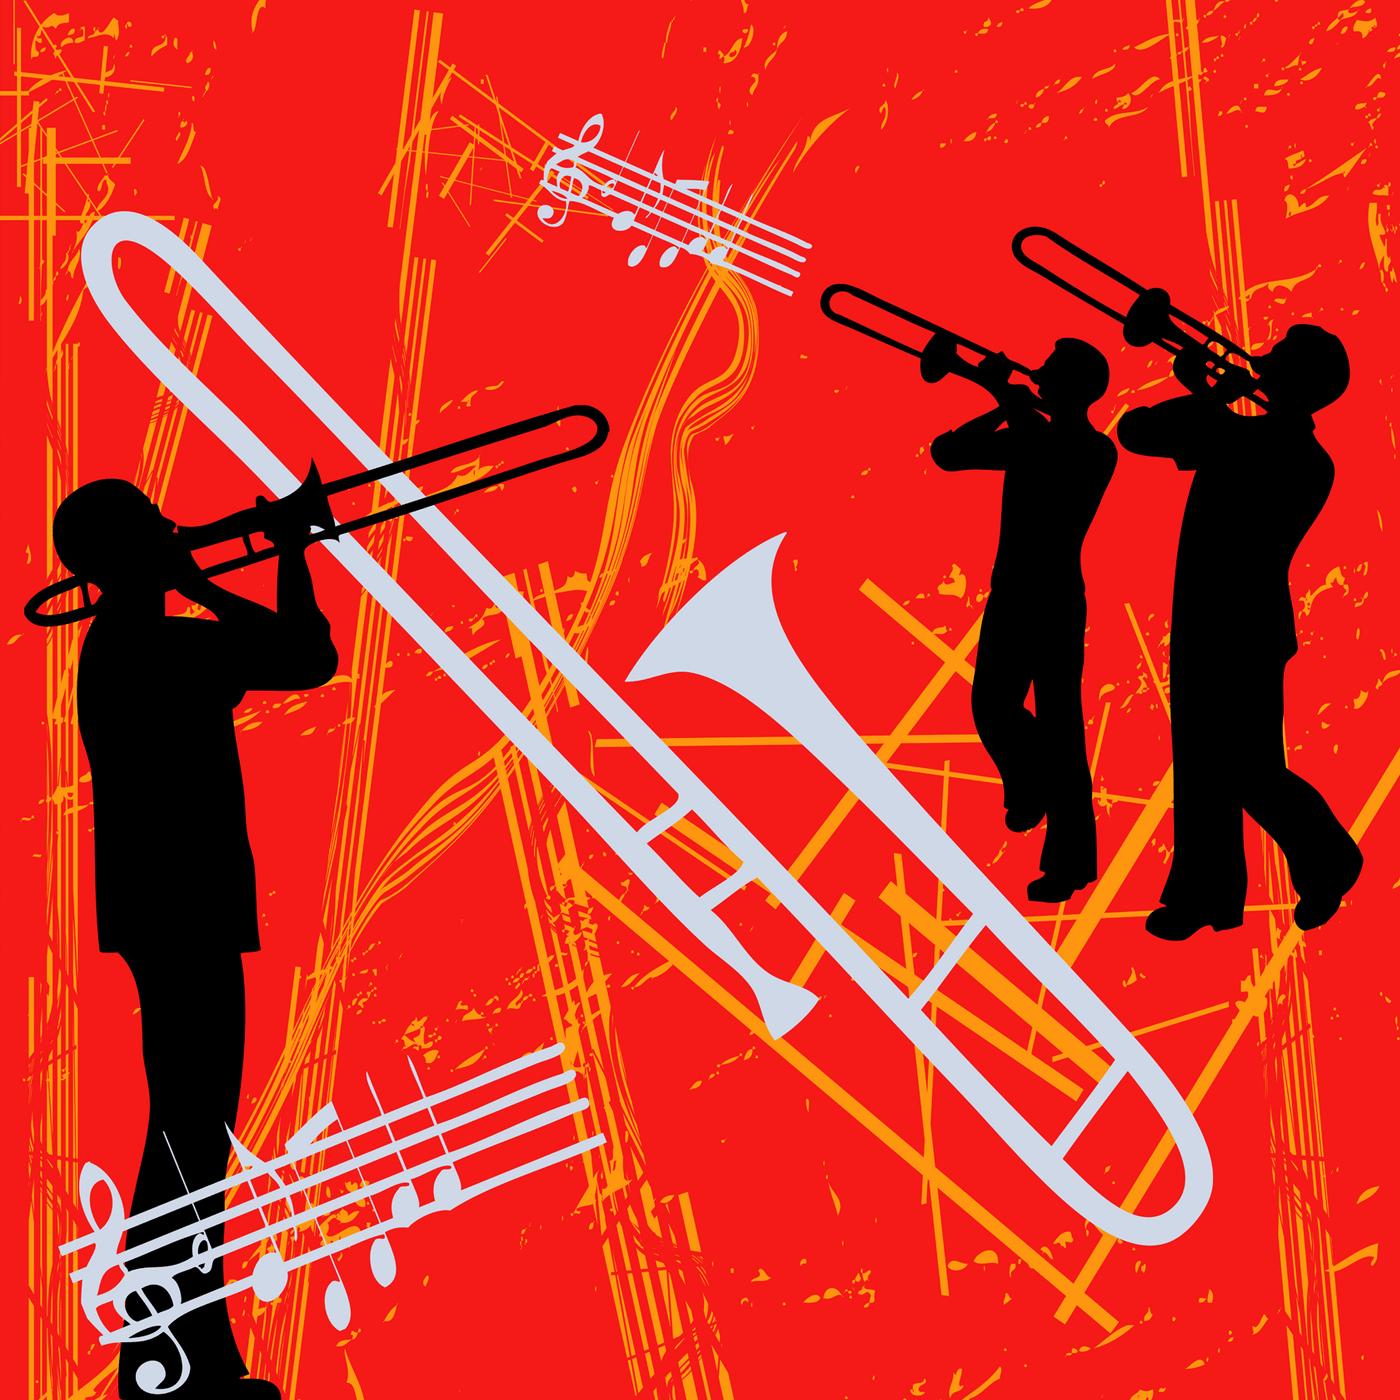 Black White Modern Wallpaper Swing Amp Big Band On Jazzradio Com Jazzradio Com Enjoy